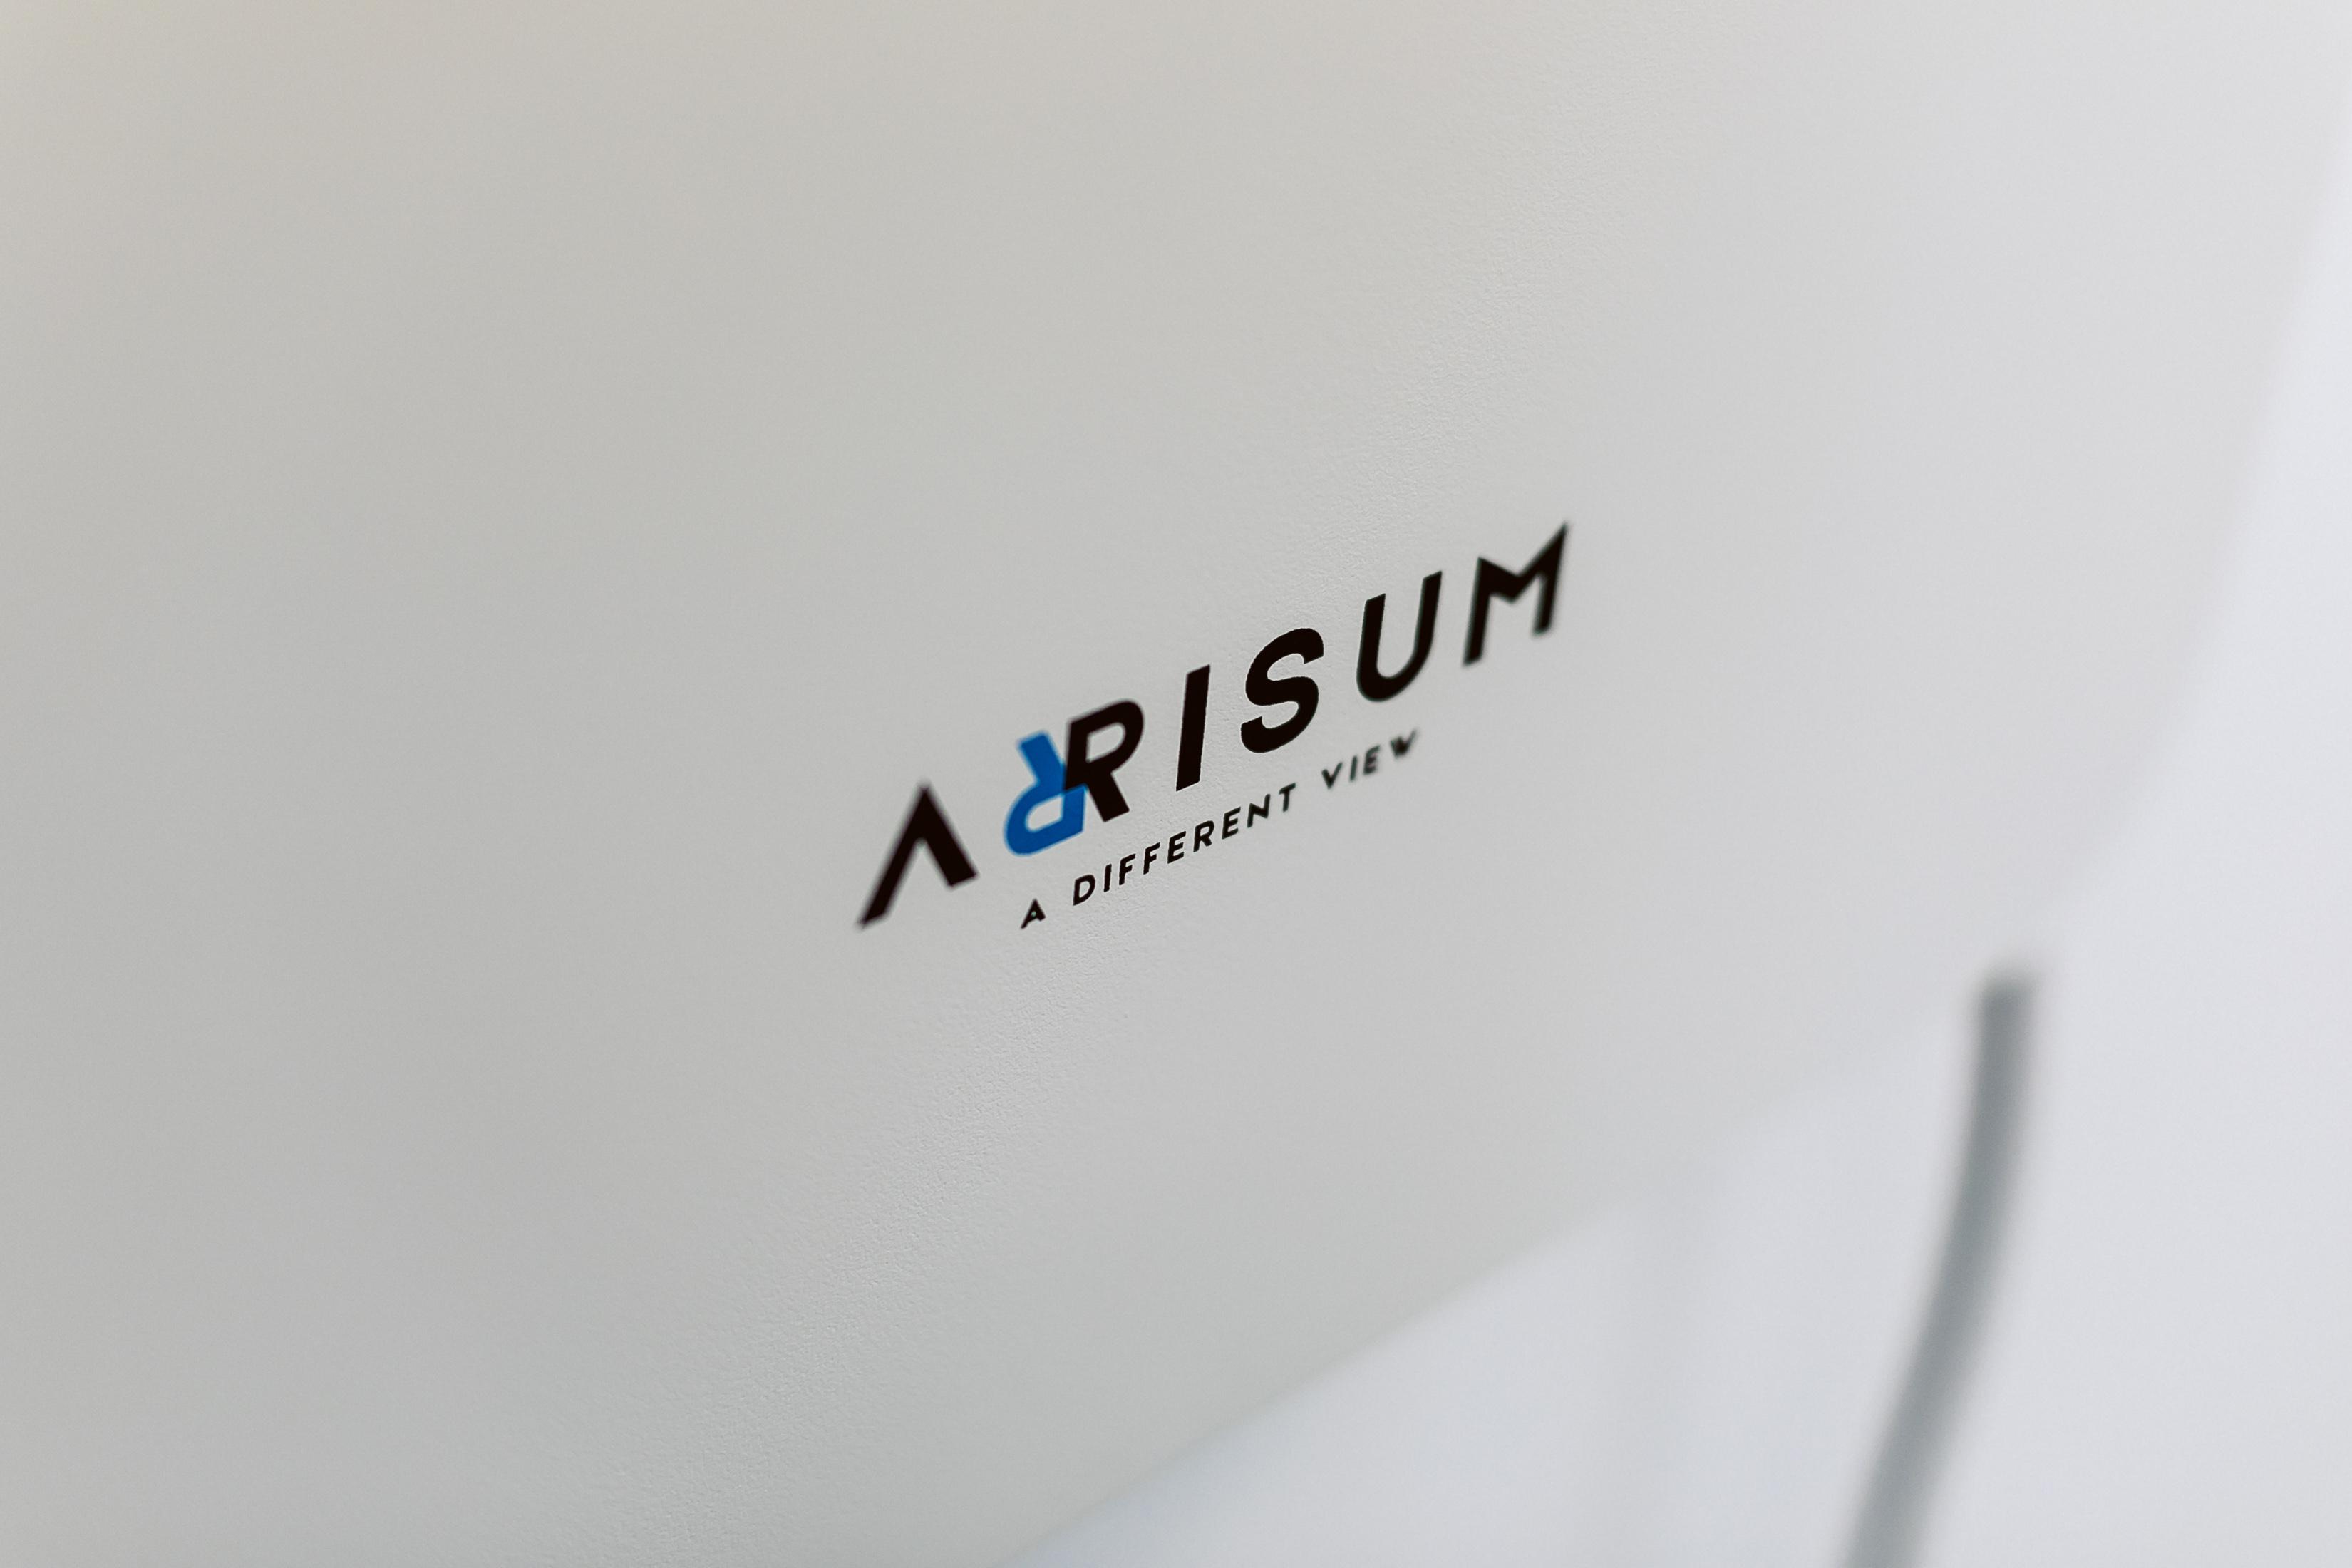 Arrisum uređaj